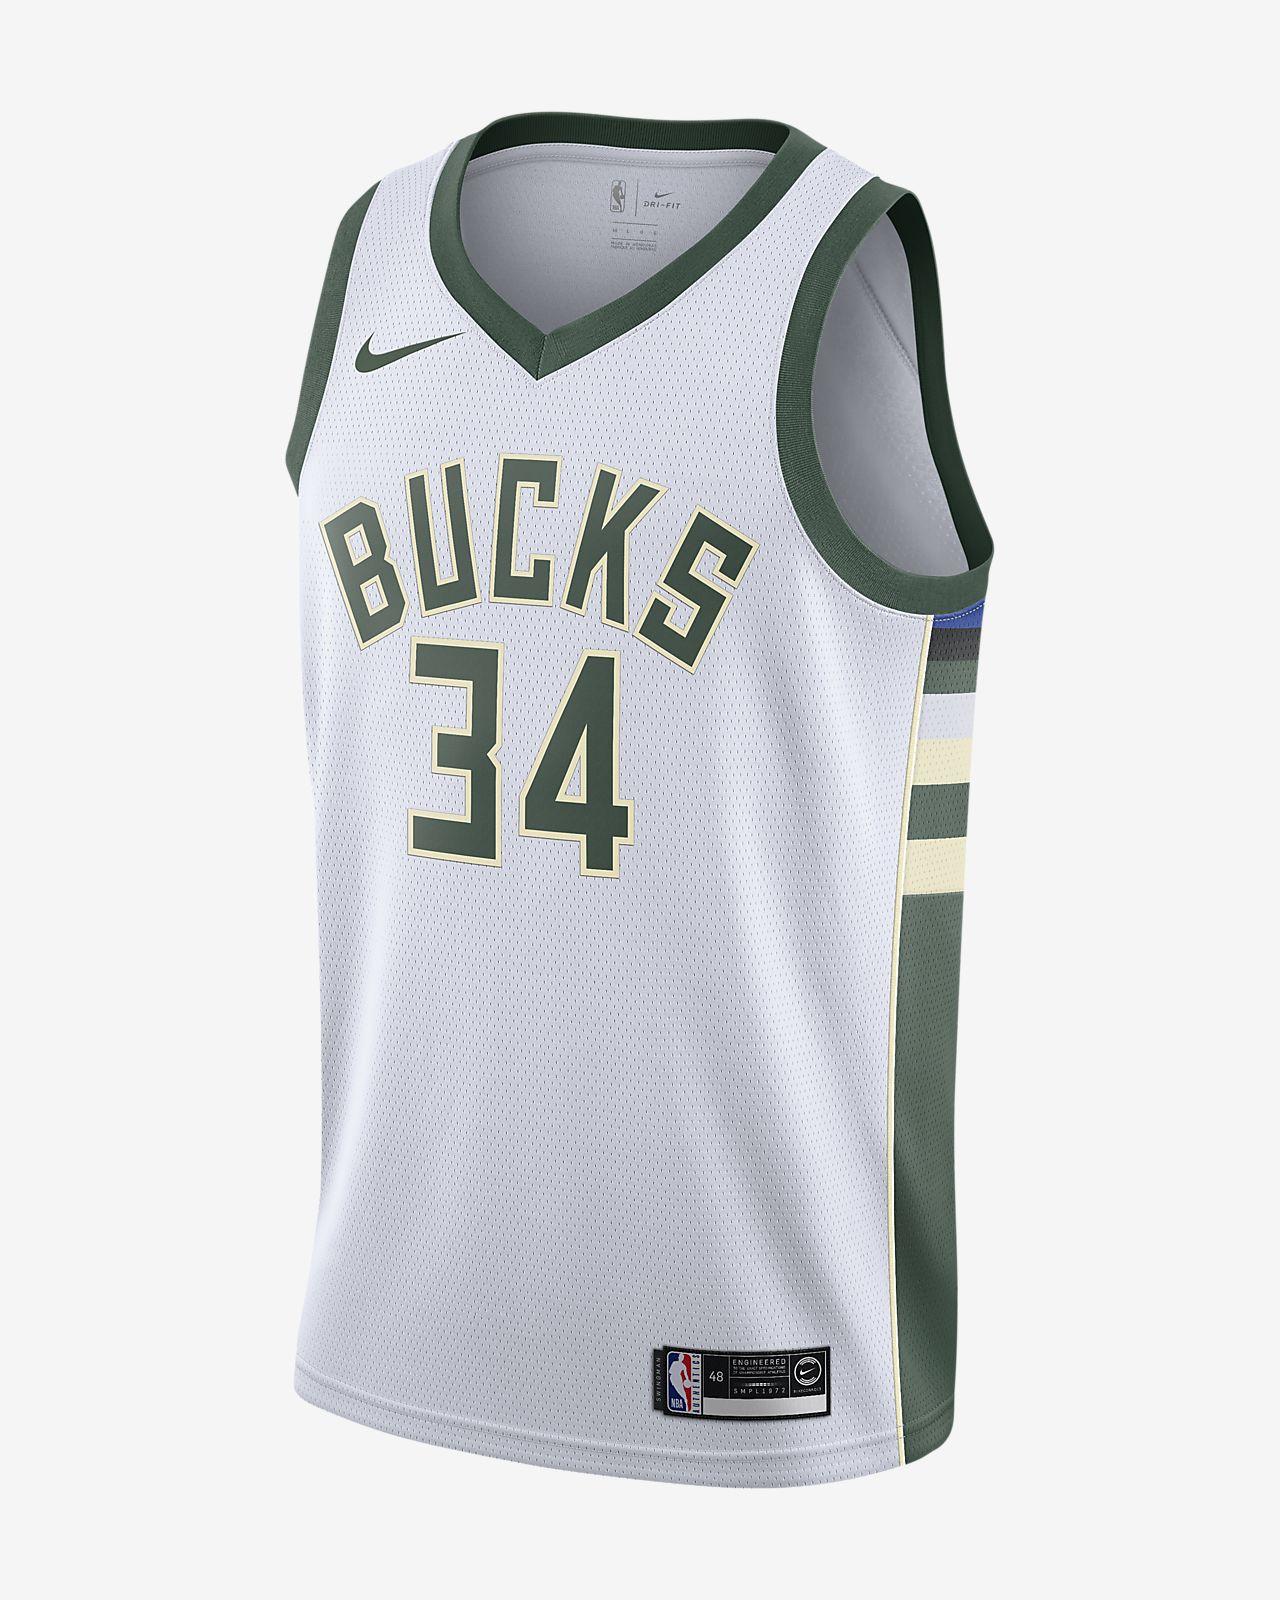 Maillot d'équipe Nike NBA Swingman Giannis Antetokounmpo Bucks Association Edition